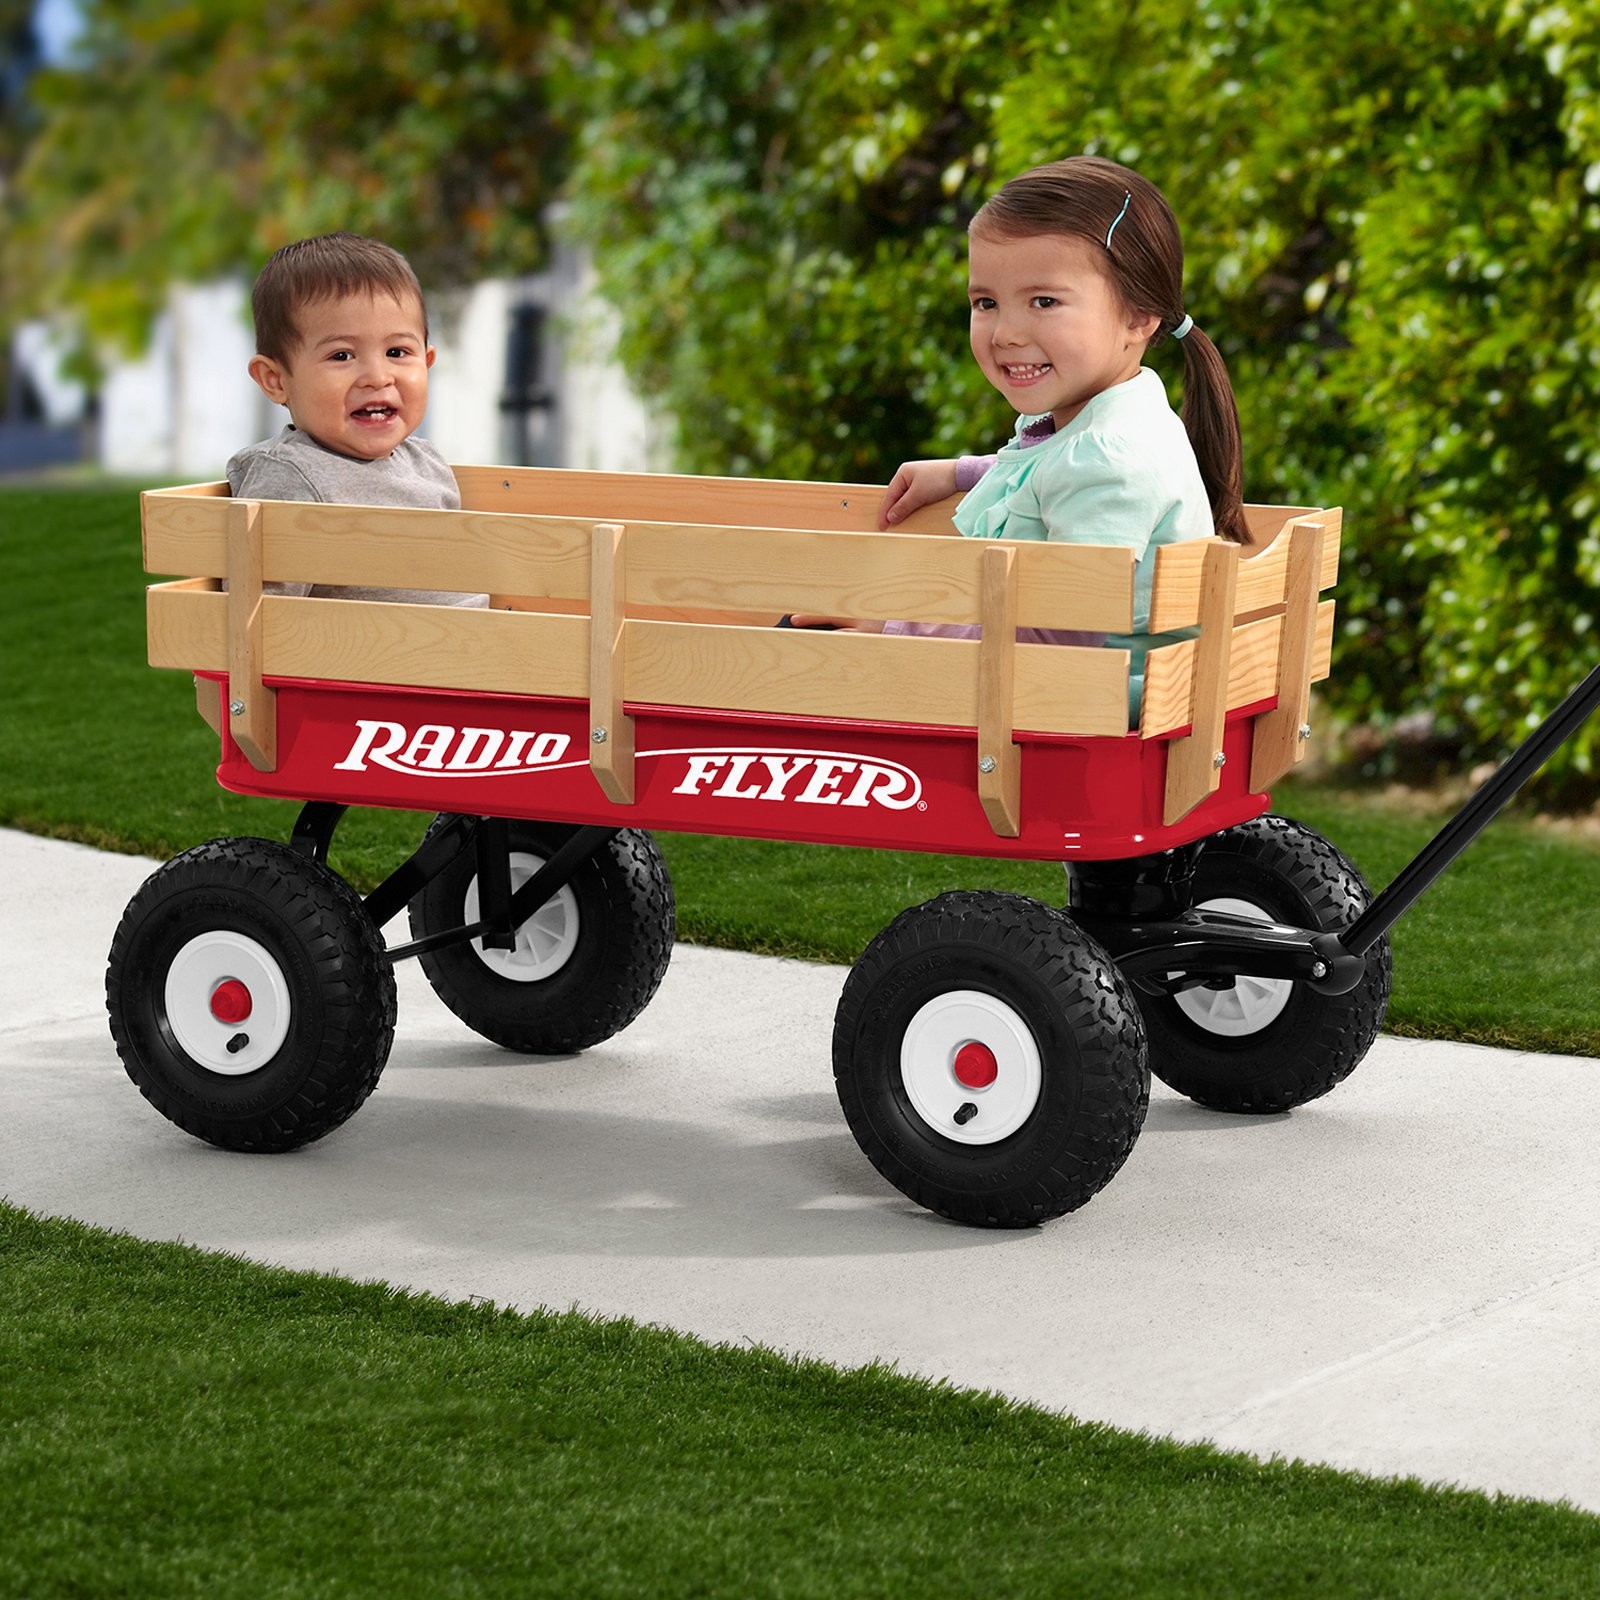 Radio Flyer All-Terrain Kids Wagon